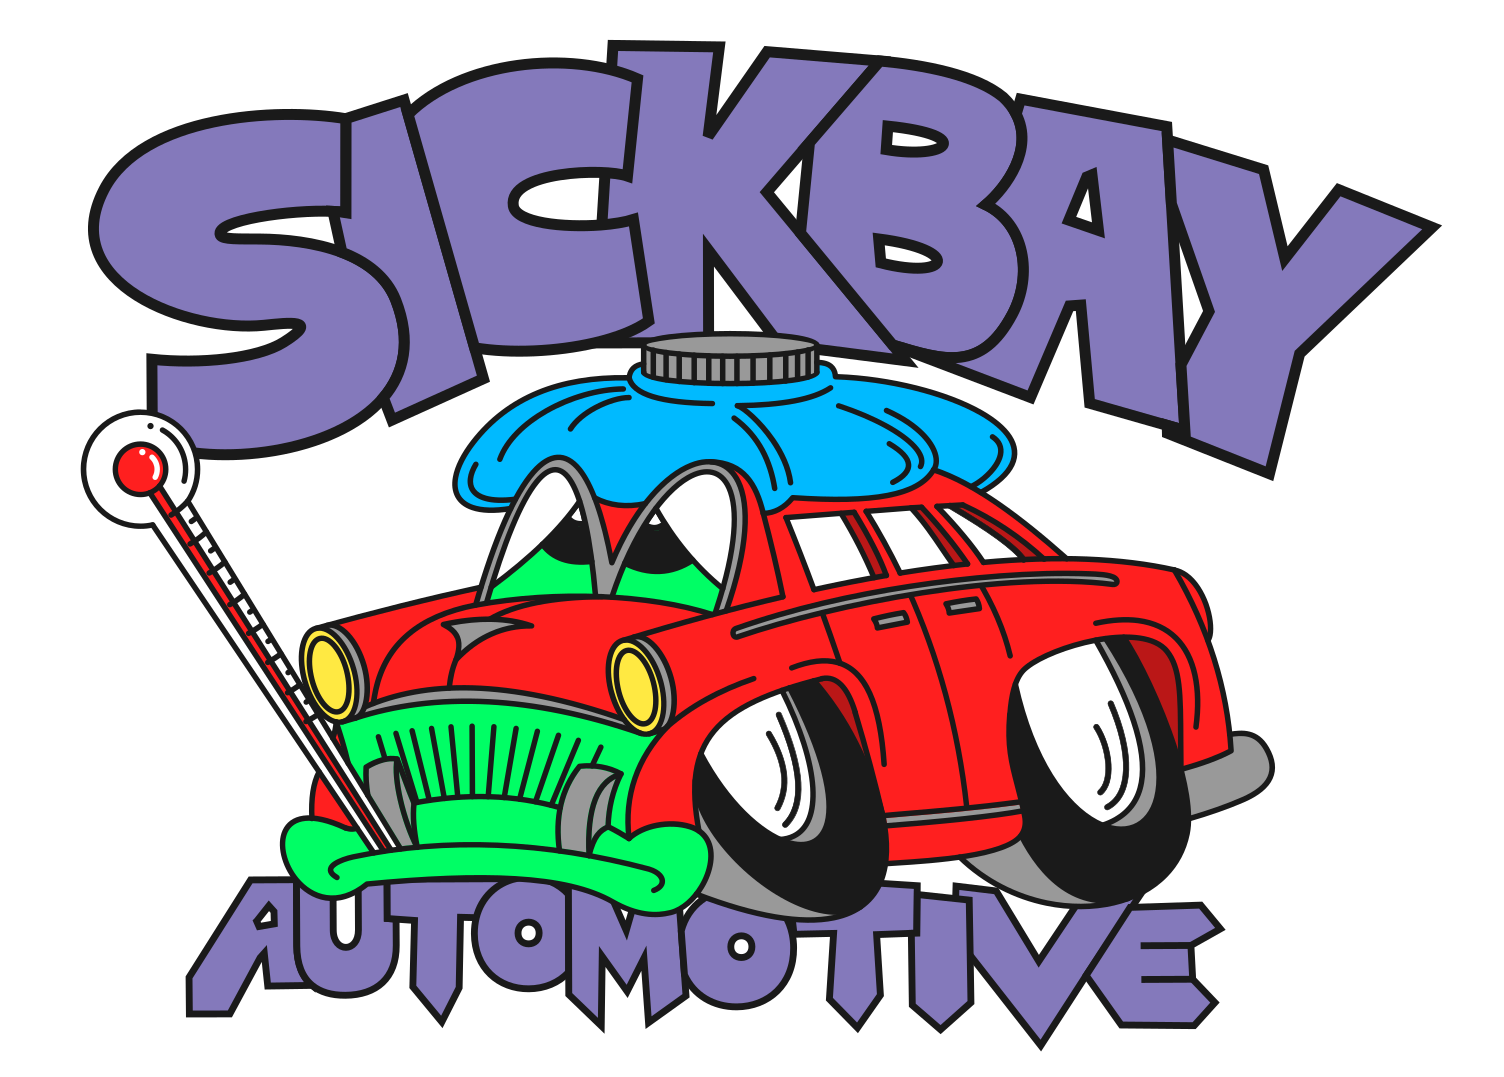 Sickbay Logo